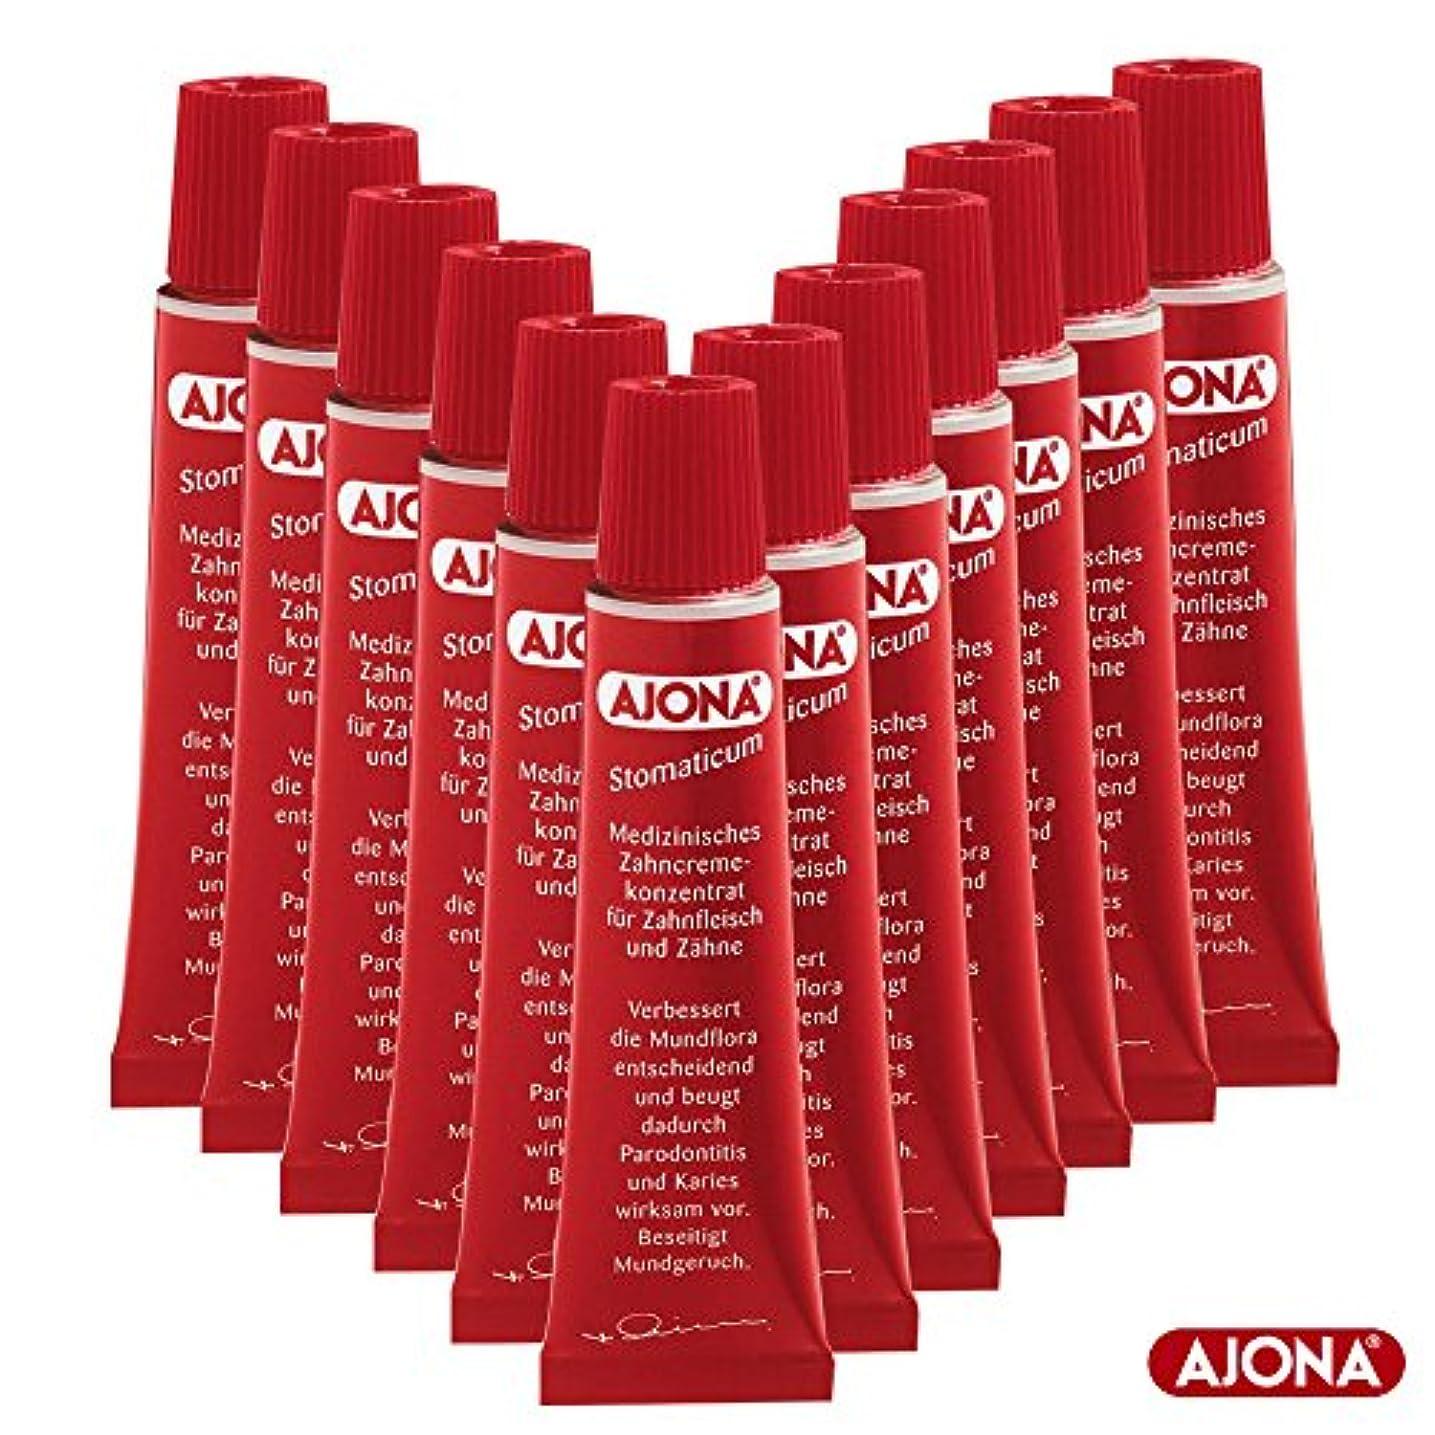 Ajona 濃縮歯磨き粉 Stomaticum Toothpaste 25ml(12x 25ml)-12Pack [並行輸入品]